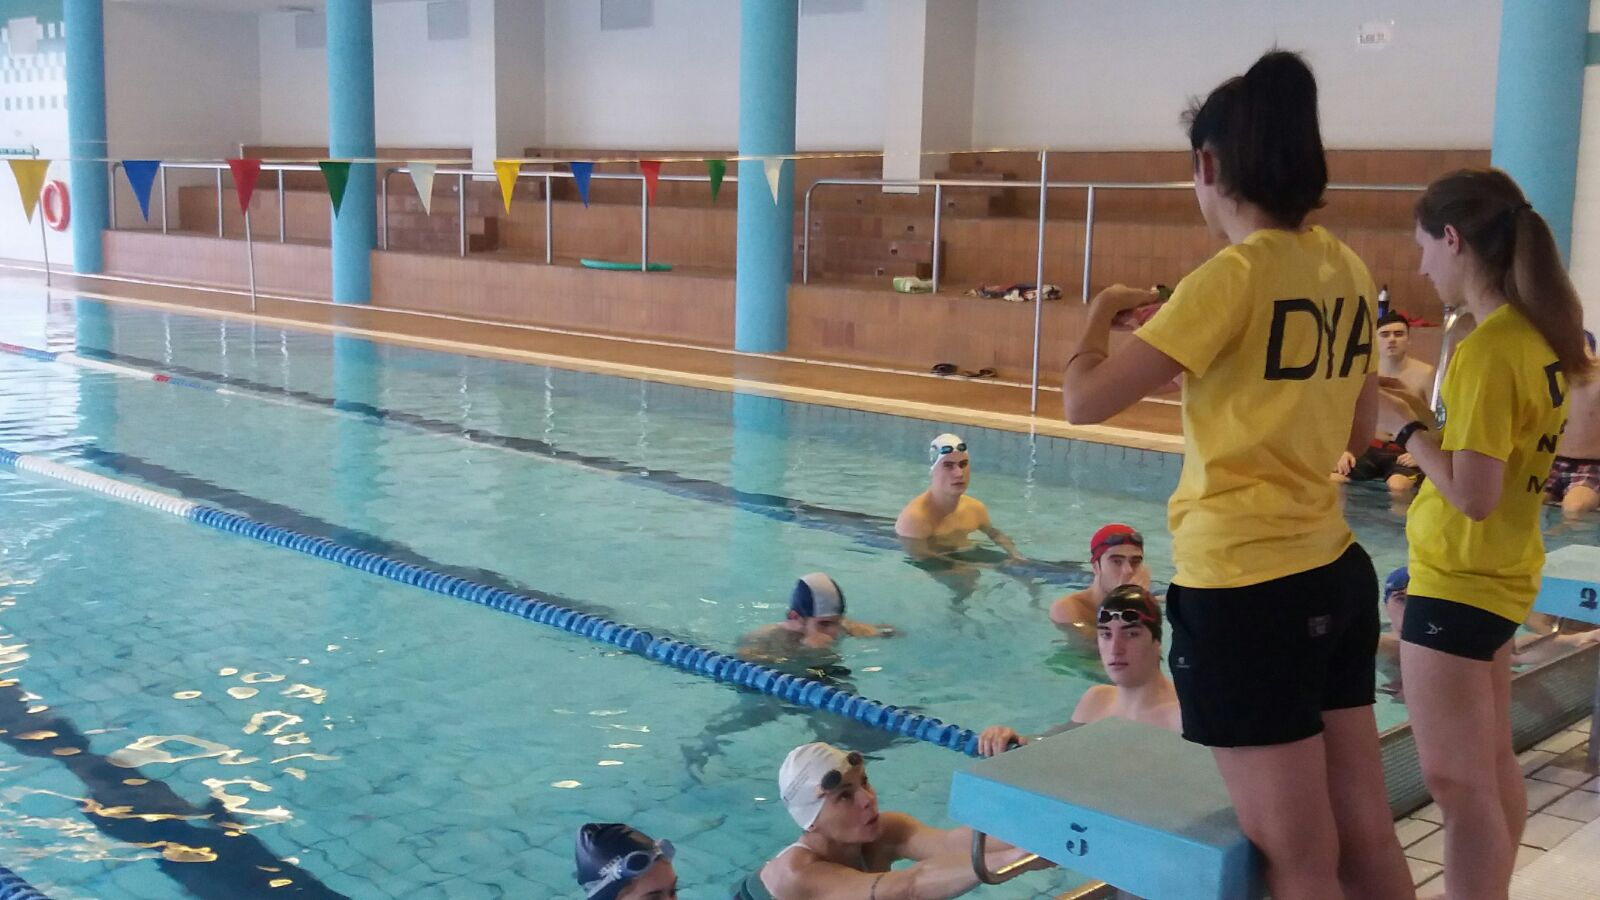 Dya navarra curso de socorrista de piscinas - Socorrista de piscina ...